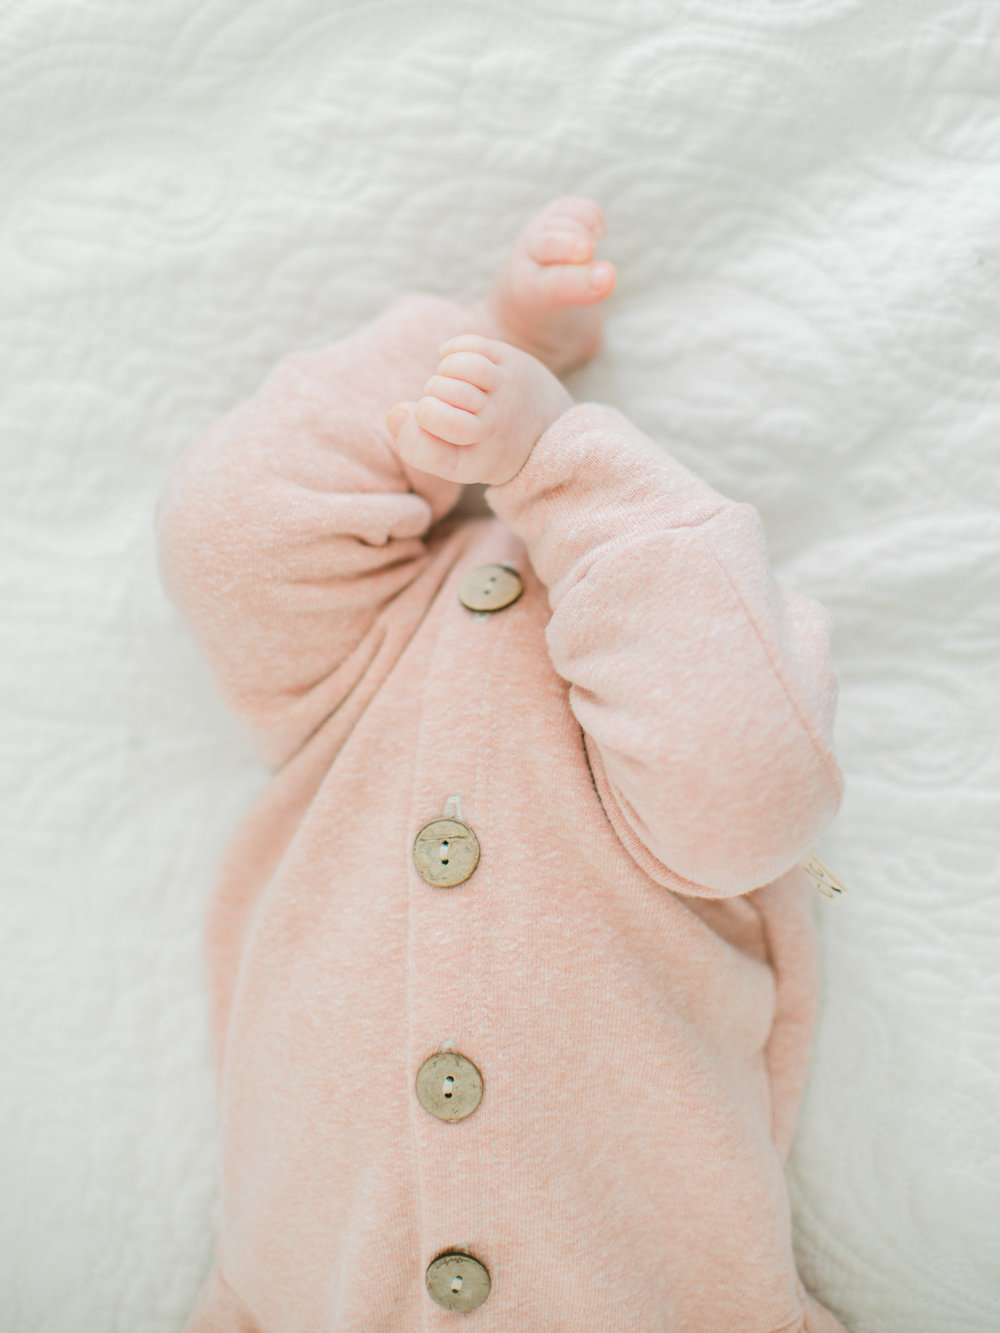 Baby Pictures, Newborn